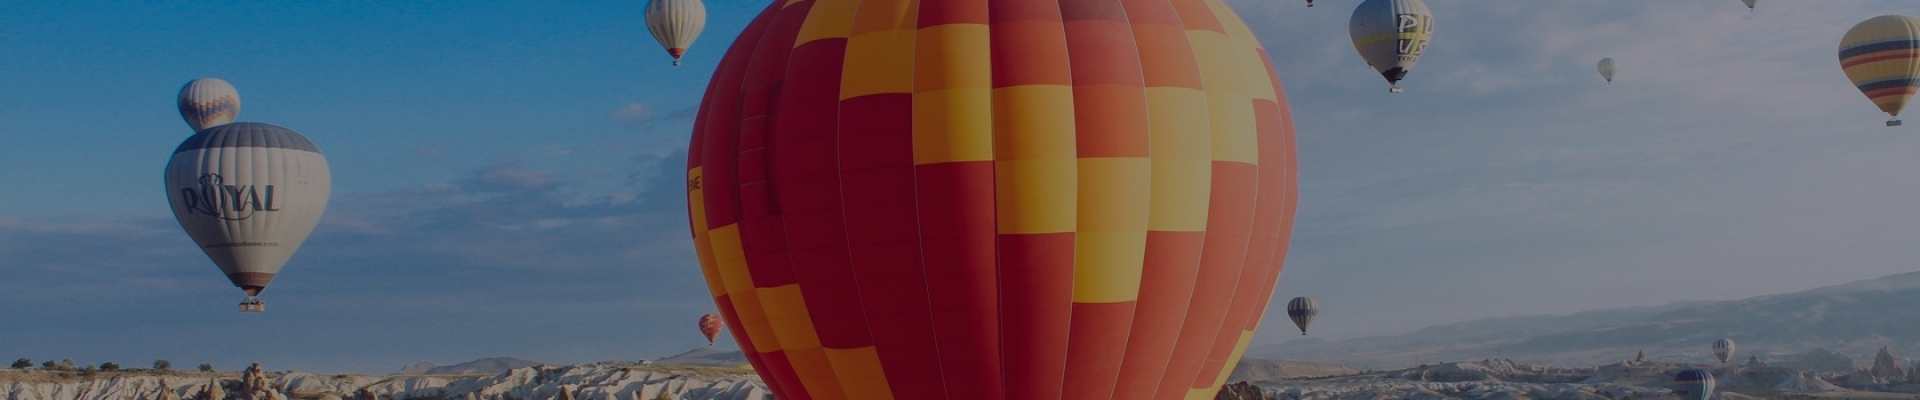 Hot air ballooning in Neemrana Fort, Rajasthan, India